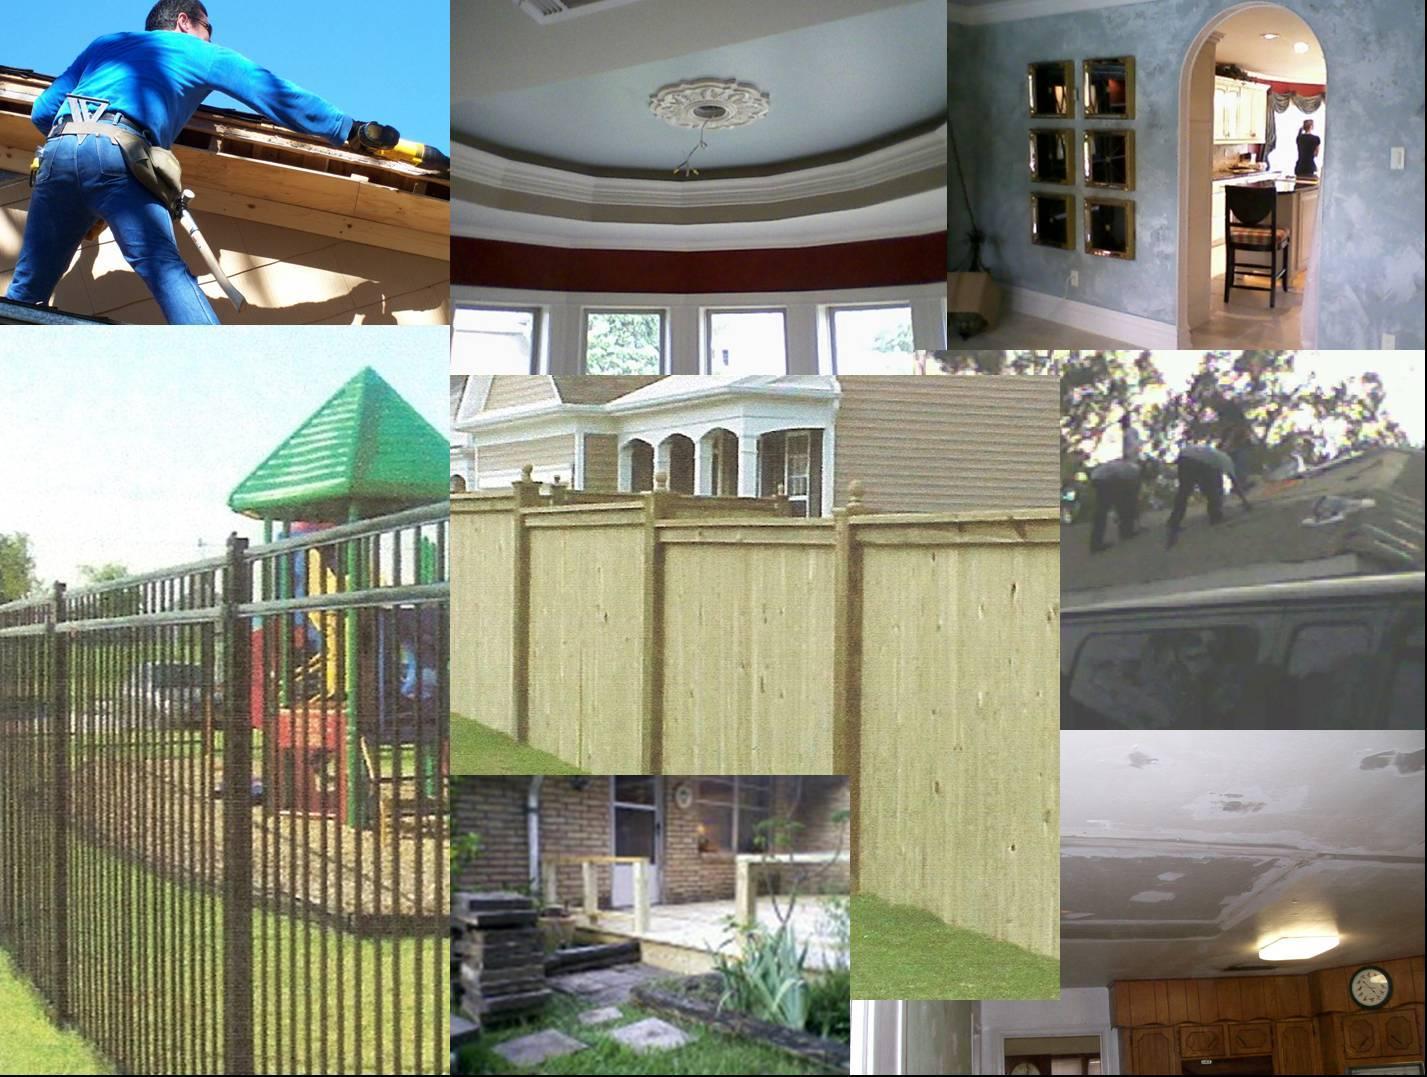 C & E General Contractors, Inc., 5300 N Braeswood, #4-315, Houston, TX, 77096, USA